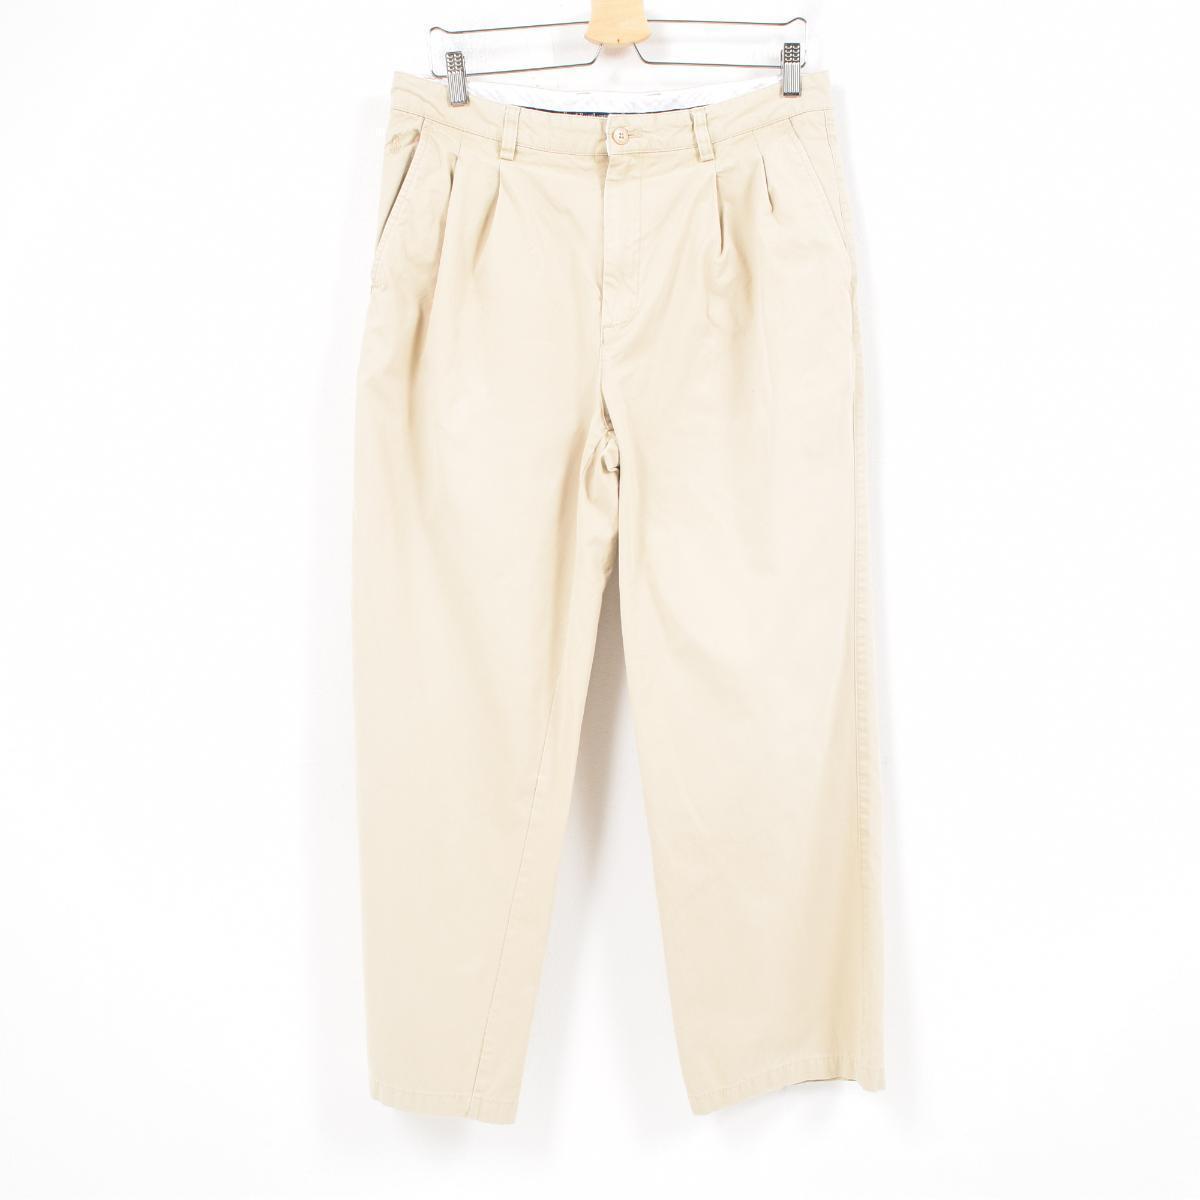 0751c32ccf5d Ralph Lauren Ralph Lauren POLO RALPH LAUREN t shirt two-tuck chino pants  men w34  wap8746